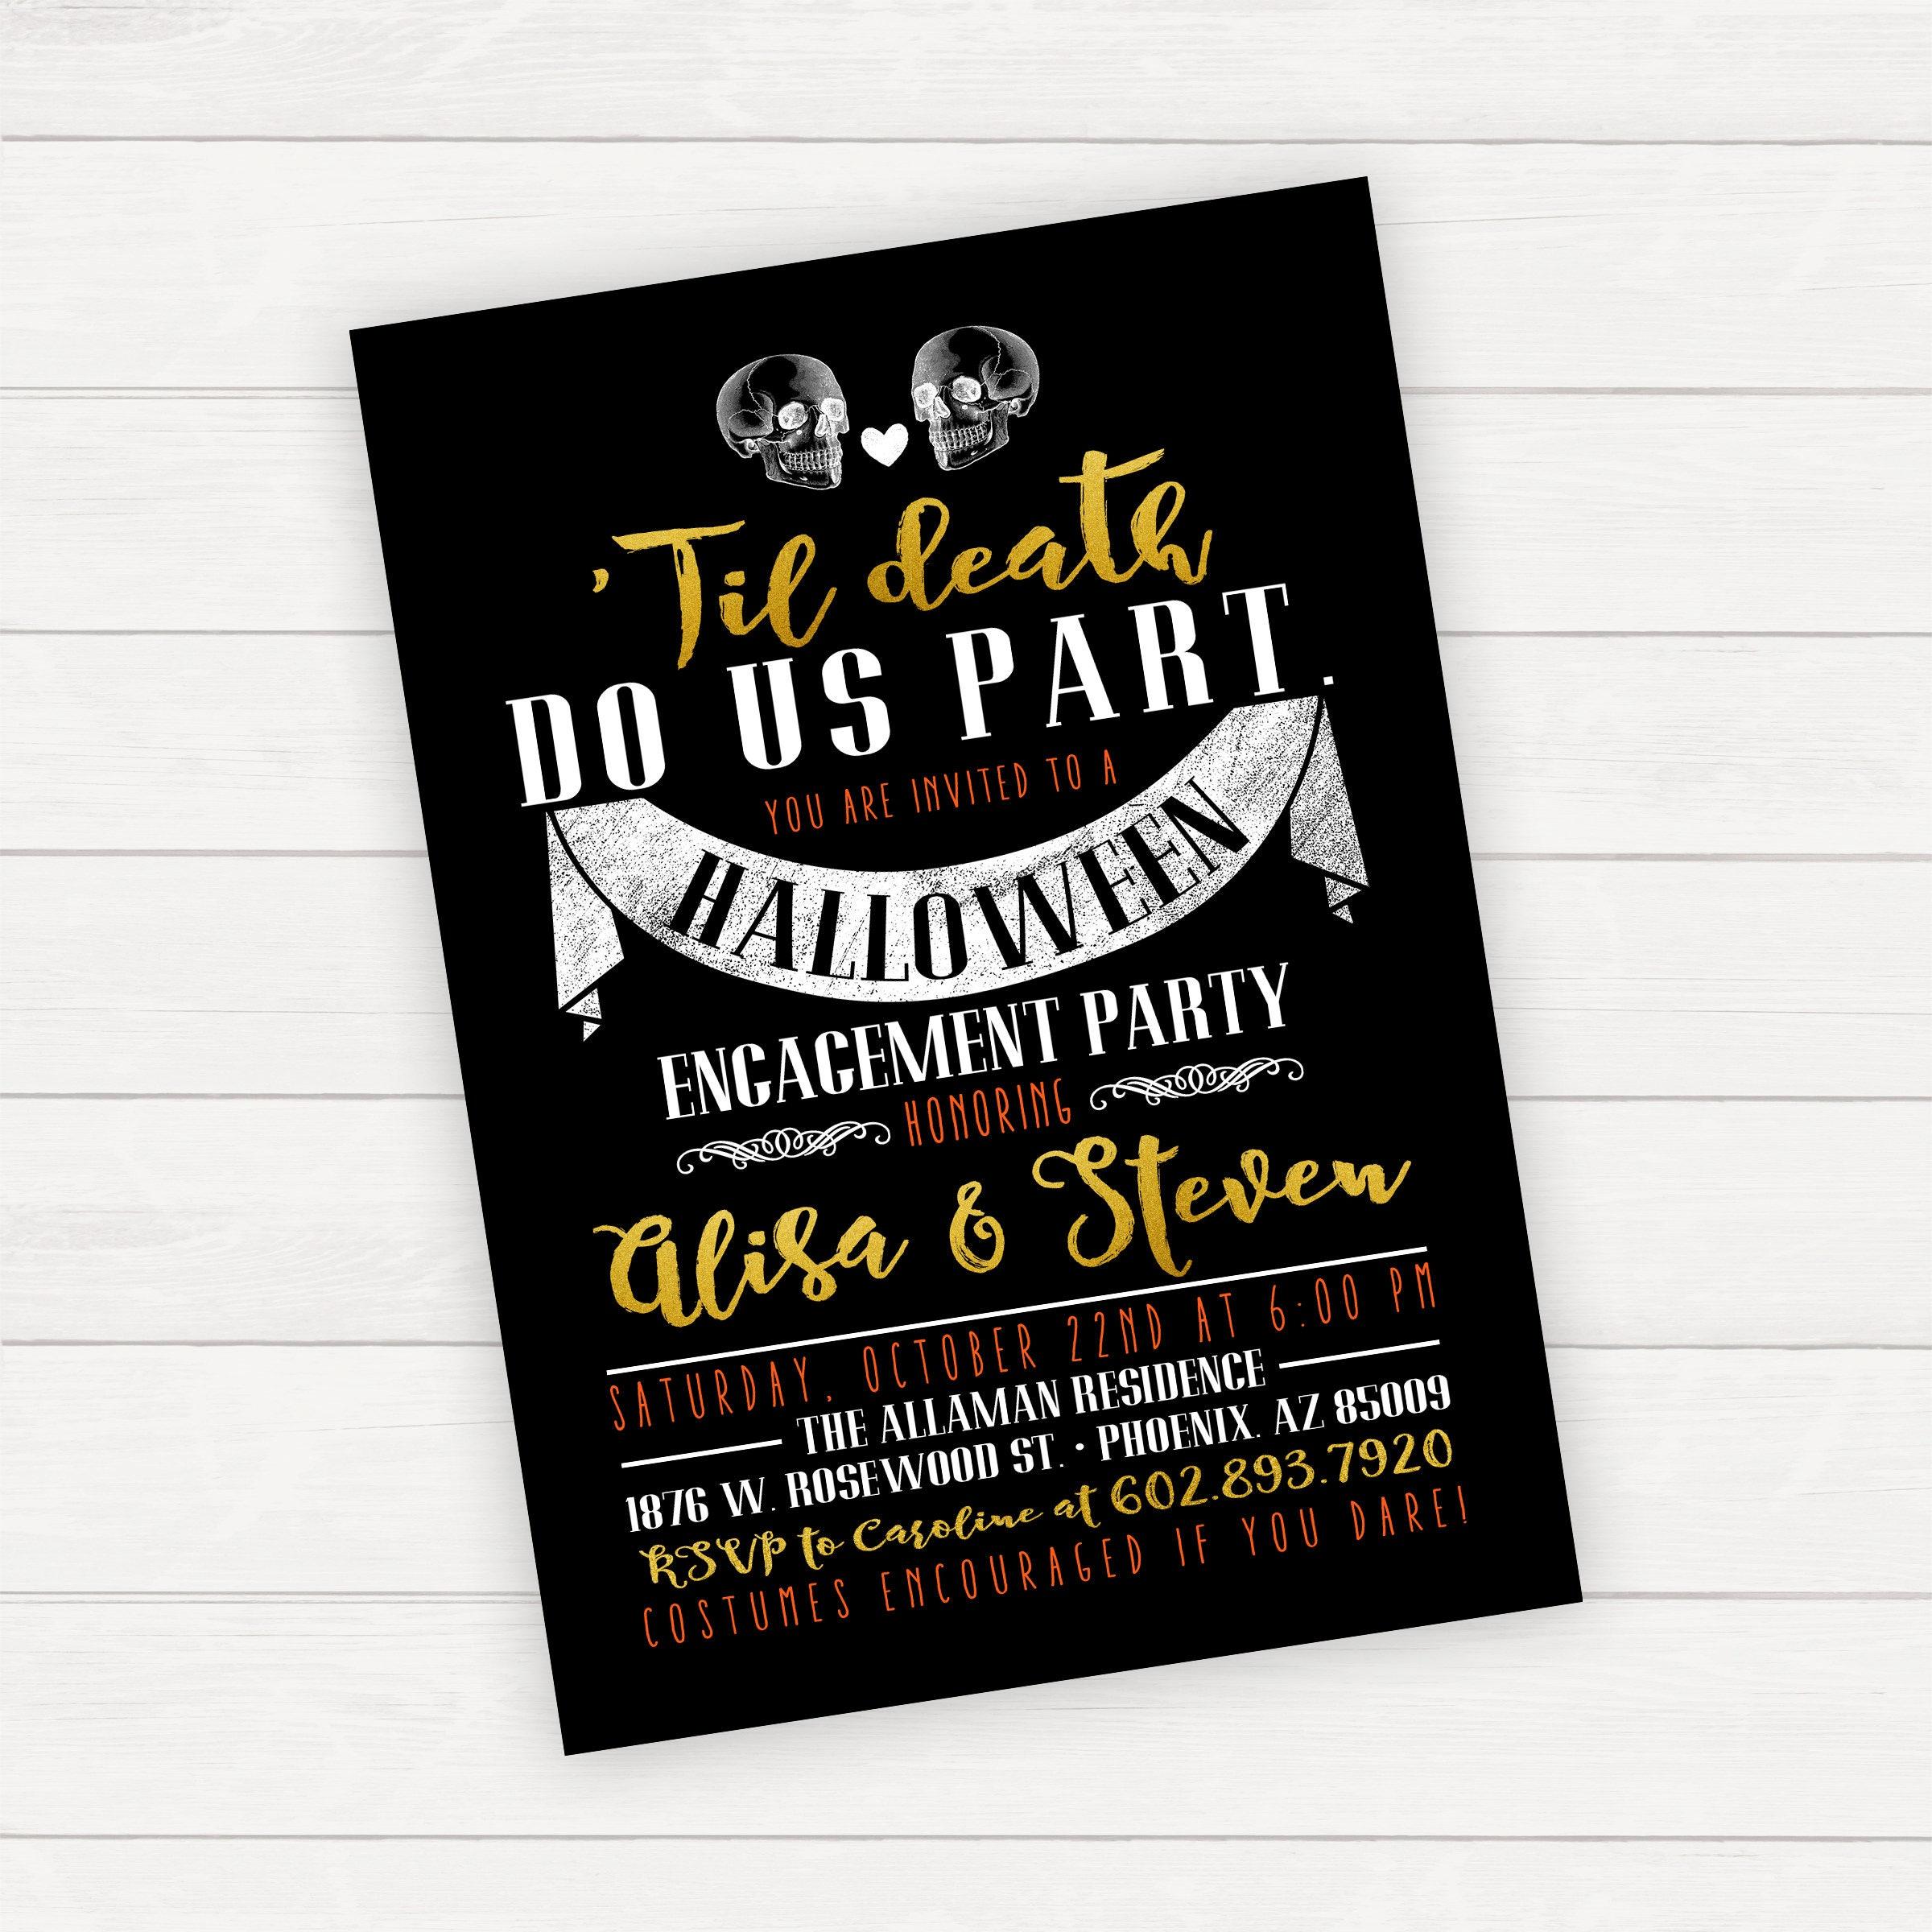 Halloween Engagement Party Invitation Til Death Do Us Part